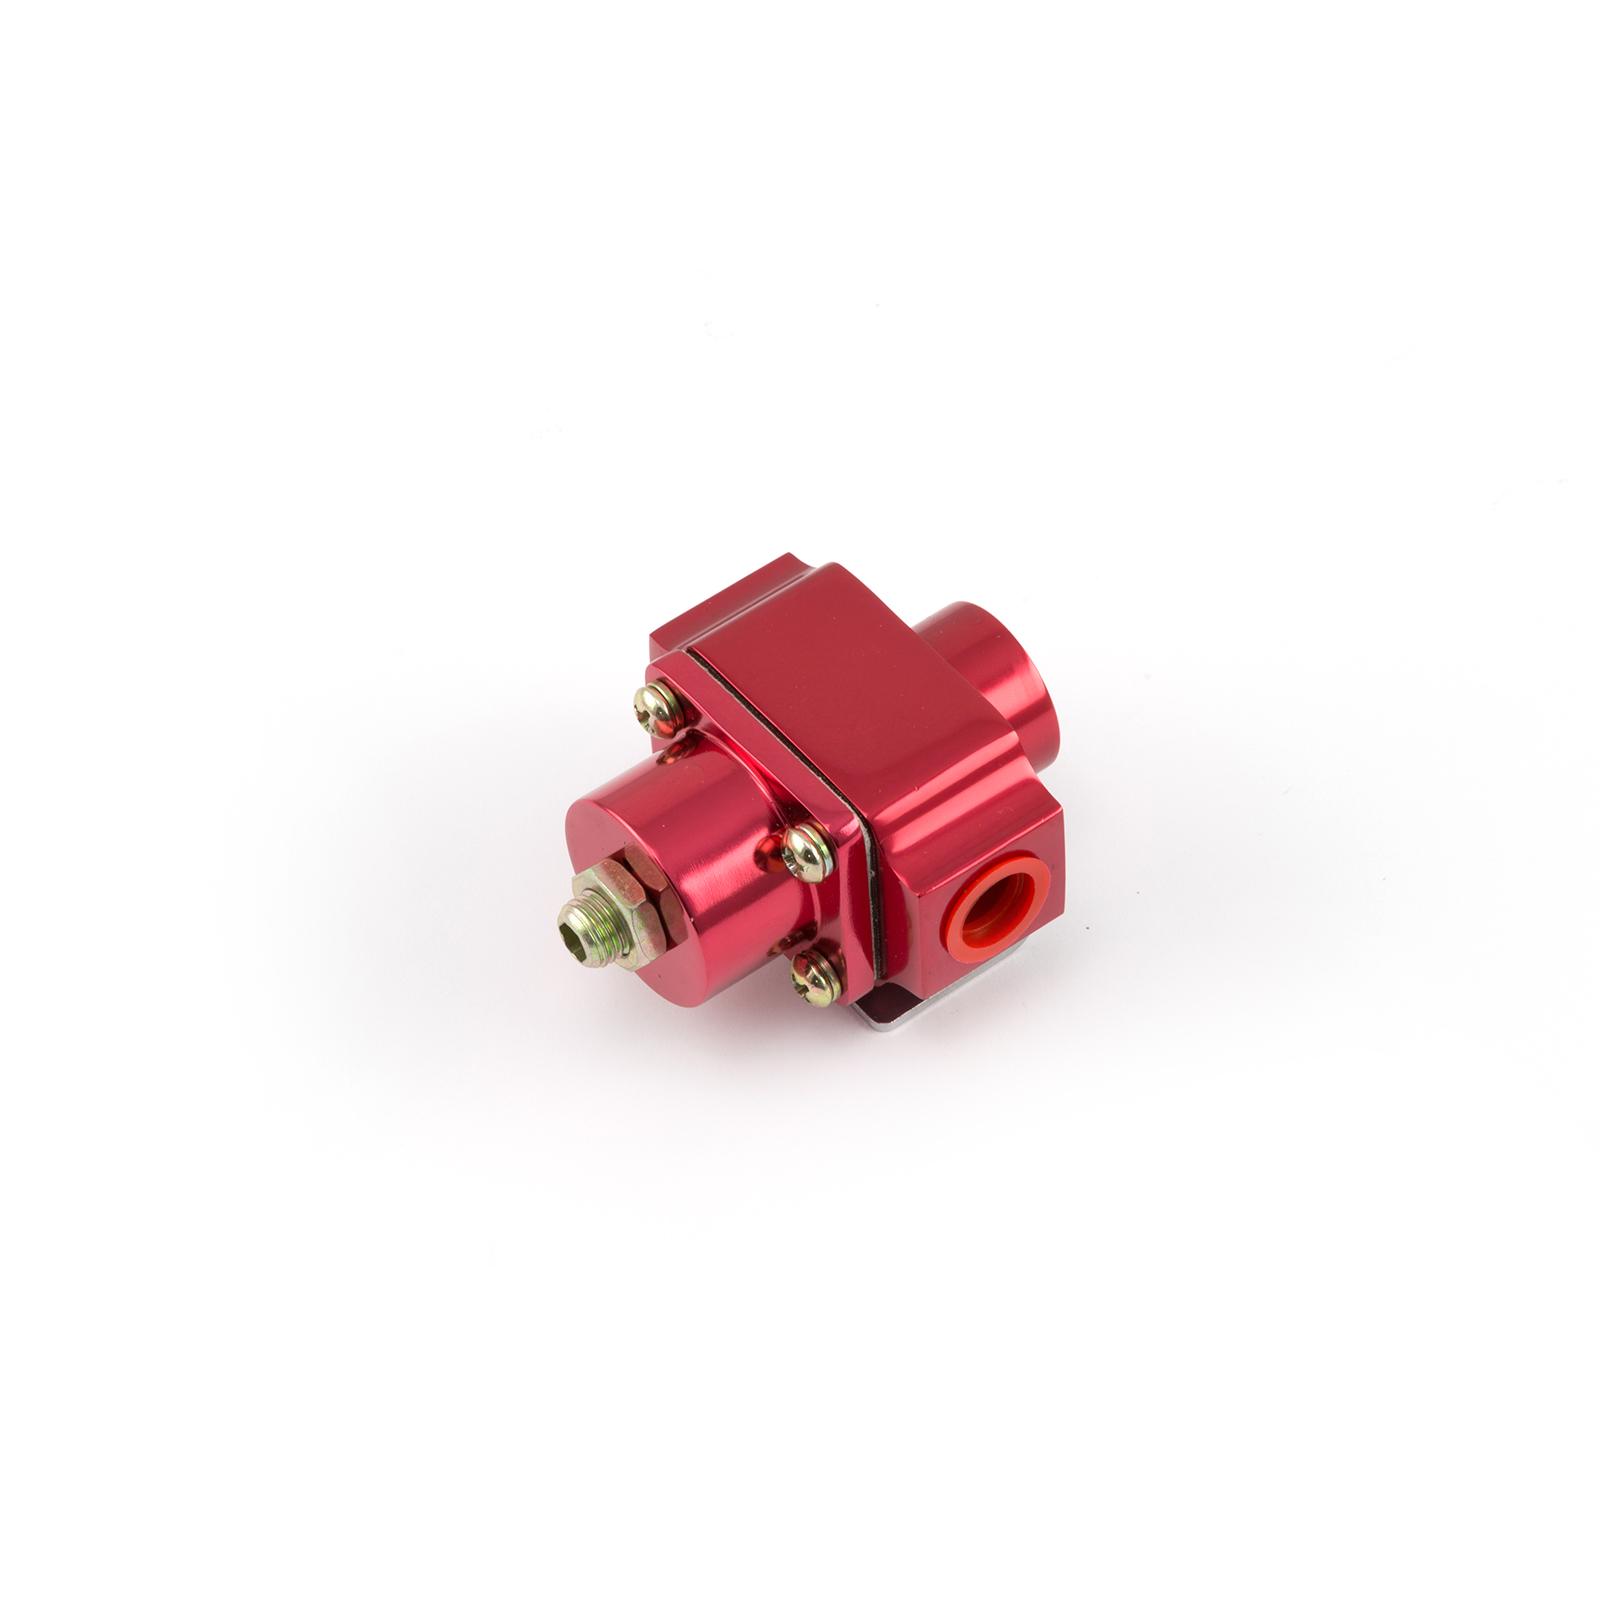 3-12 psi Adjustable Universal Deadhead Fuel Pressure Billet Regulator Red